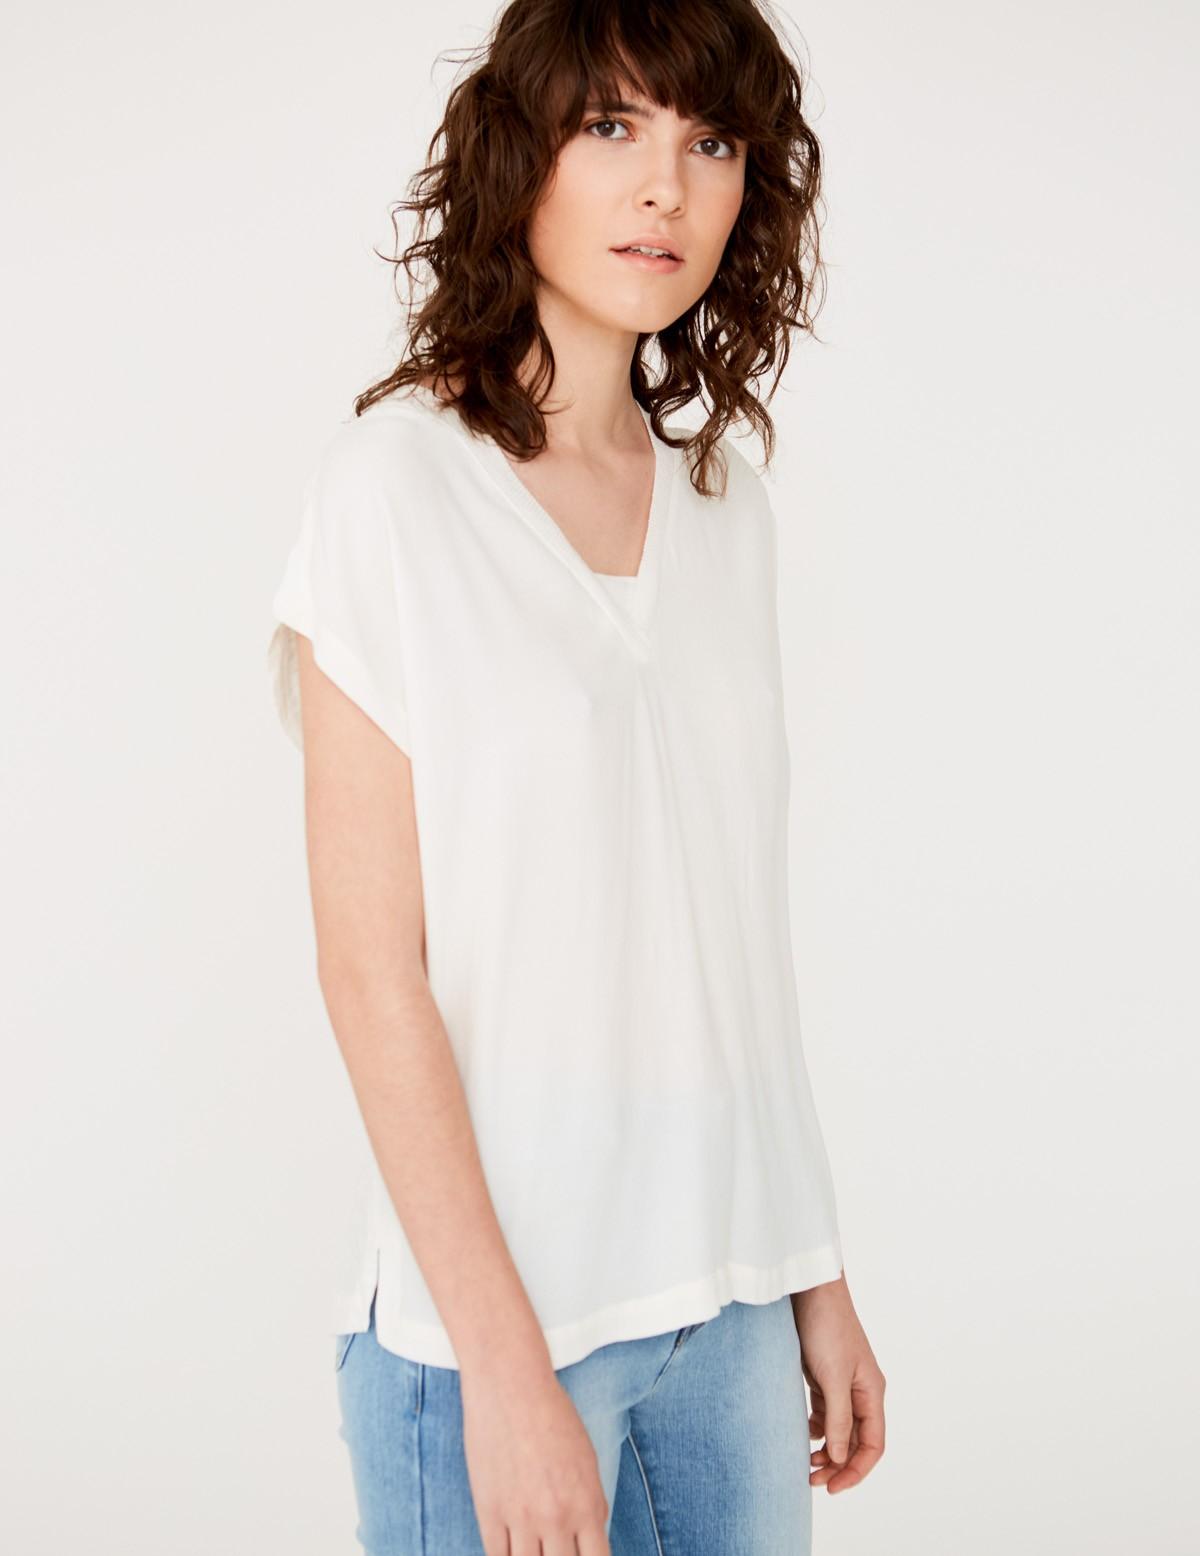 Camiseta tejidos combinados